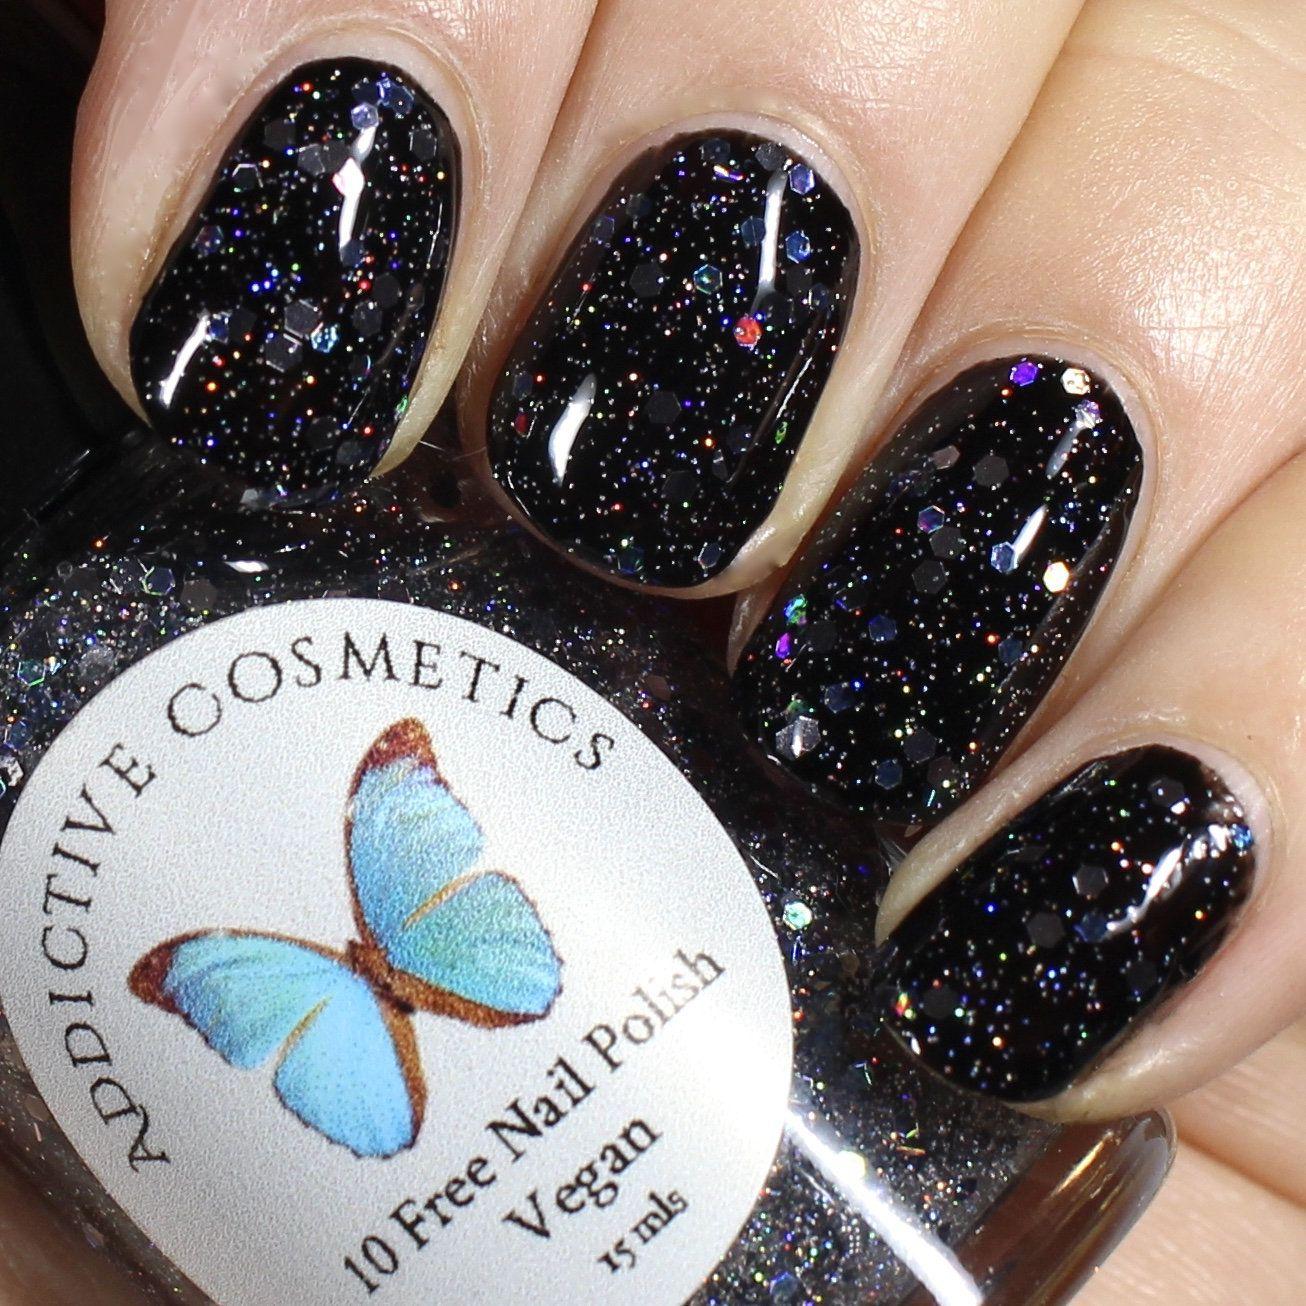 New 10 Free Glitter Nail Polish Its A Rave Vegan Friendly Cruelty Free Nail Polish Nail Designs Glitter Nail Polish